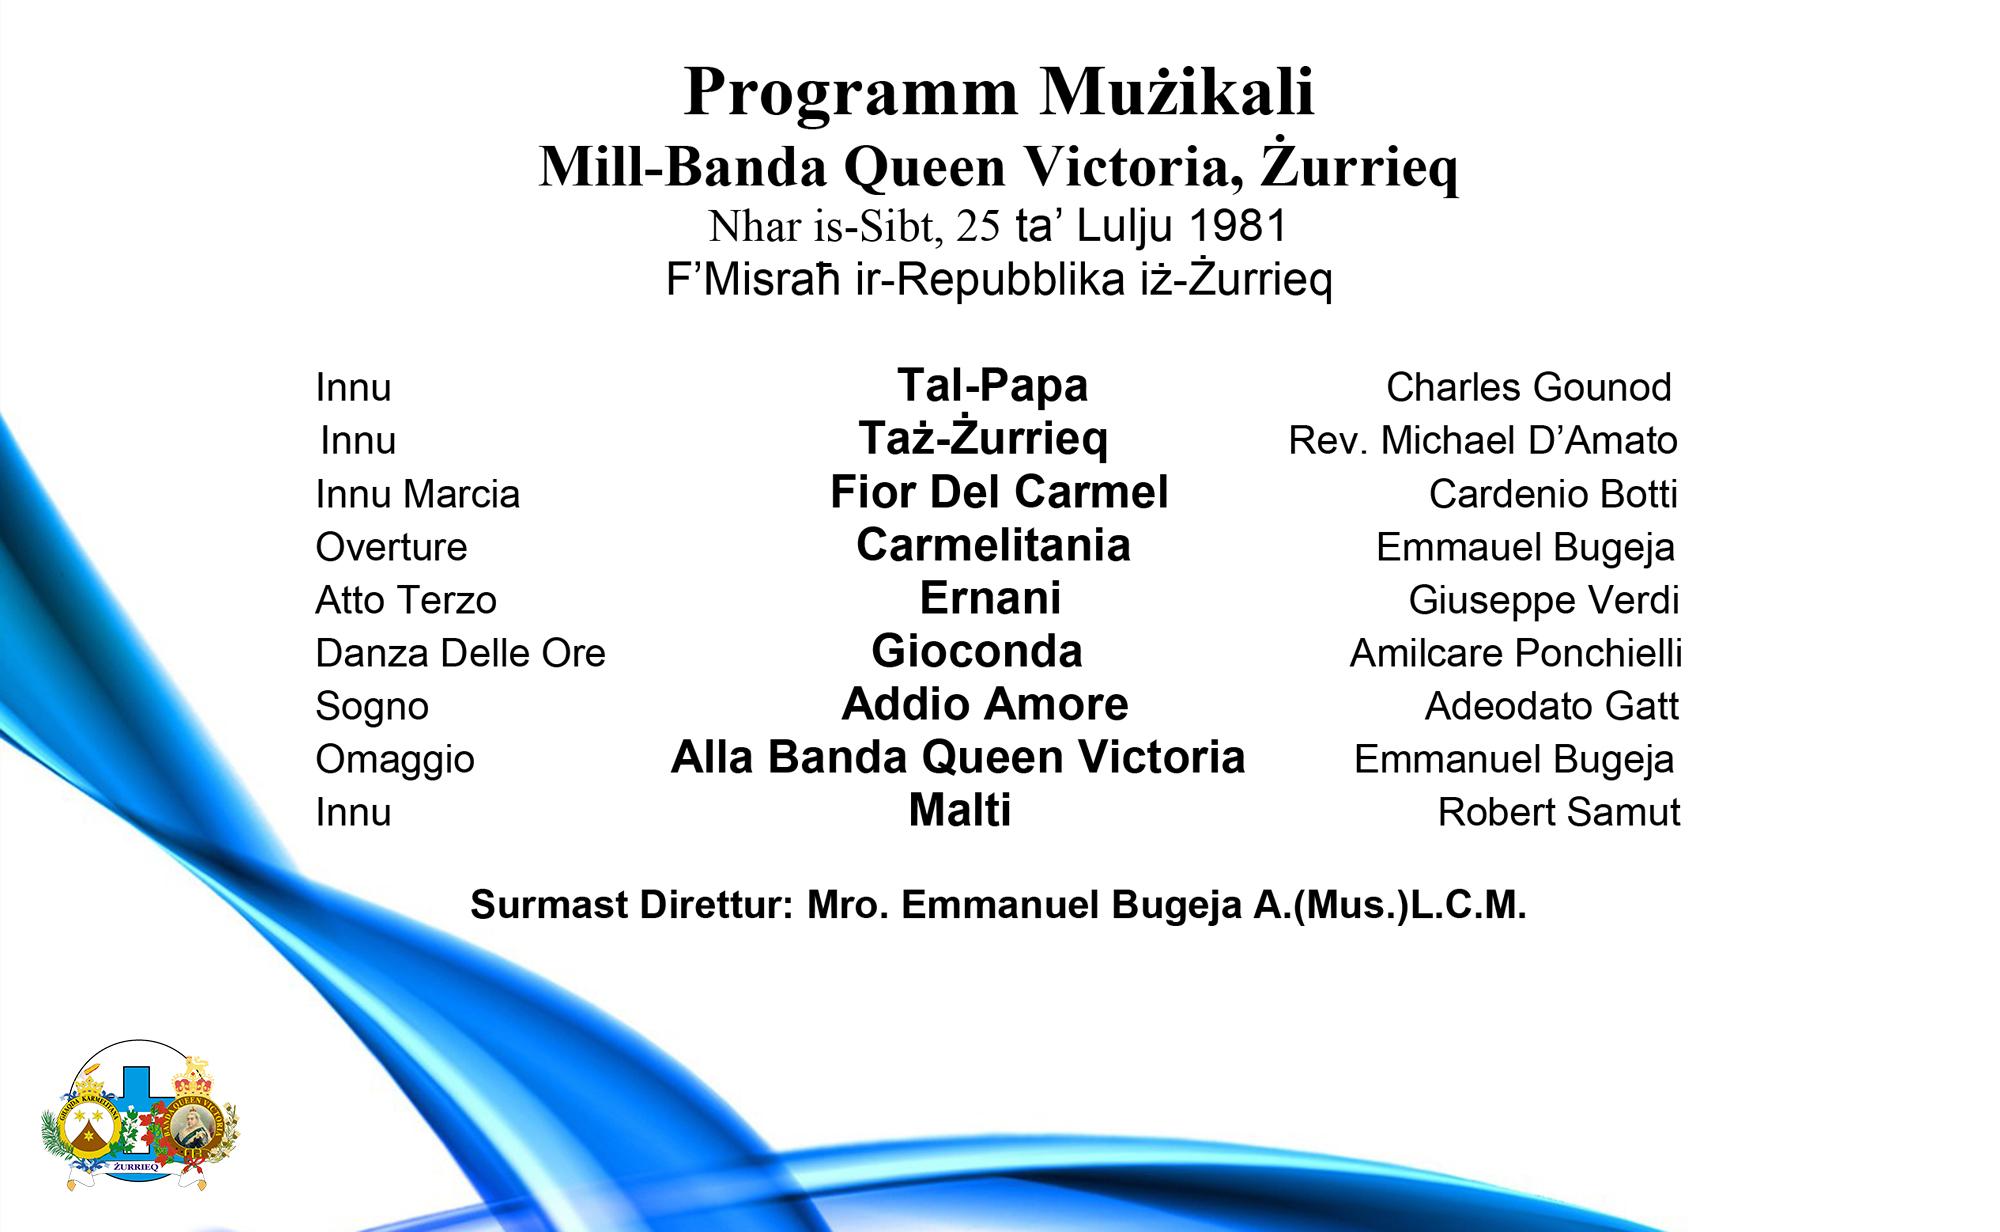 1981 Programm Strumentali